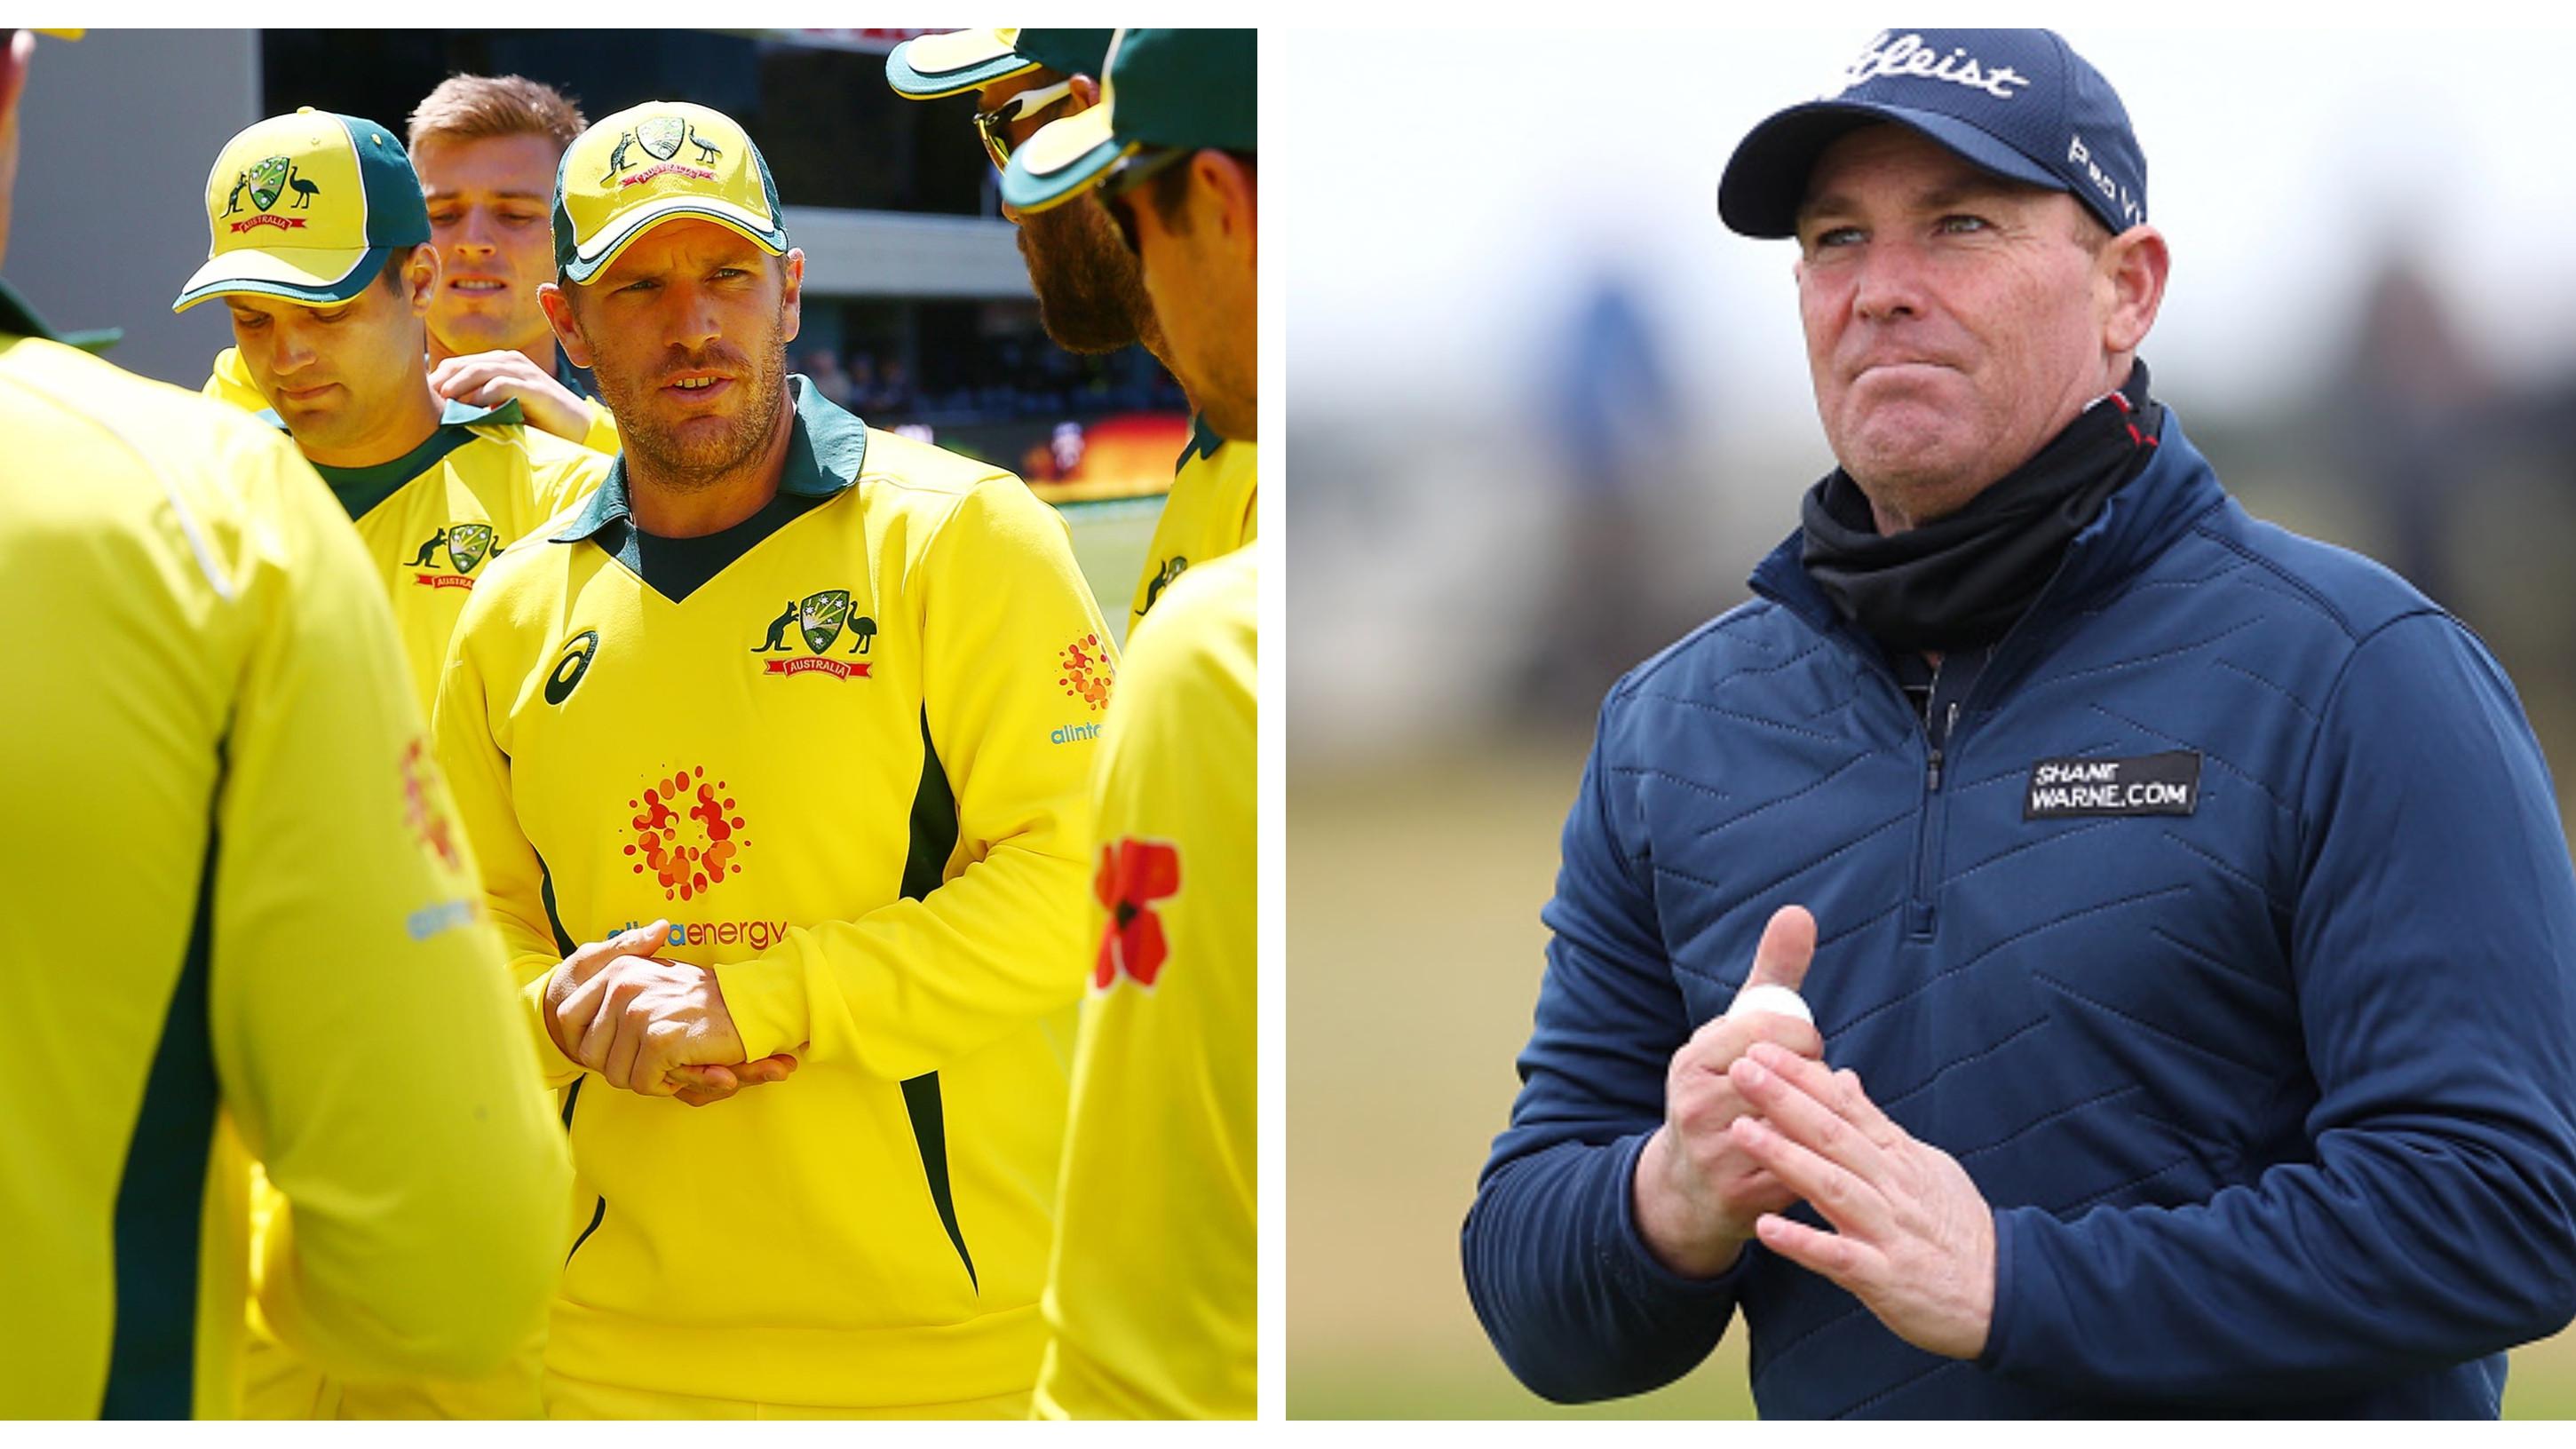 Shane Warne confident of Australia's World Cup chances